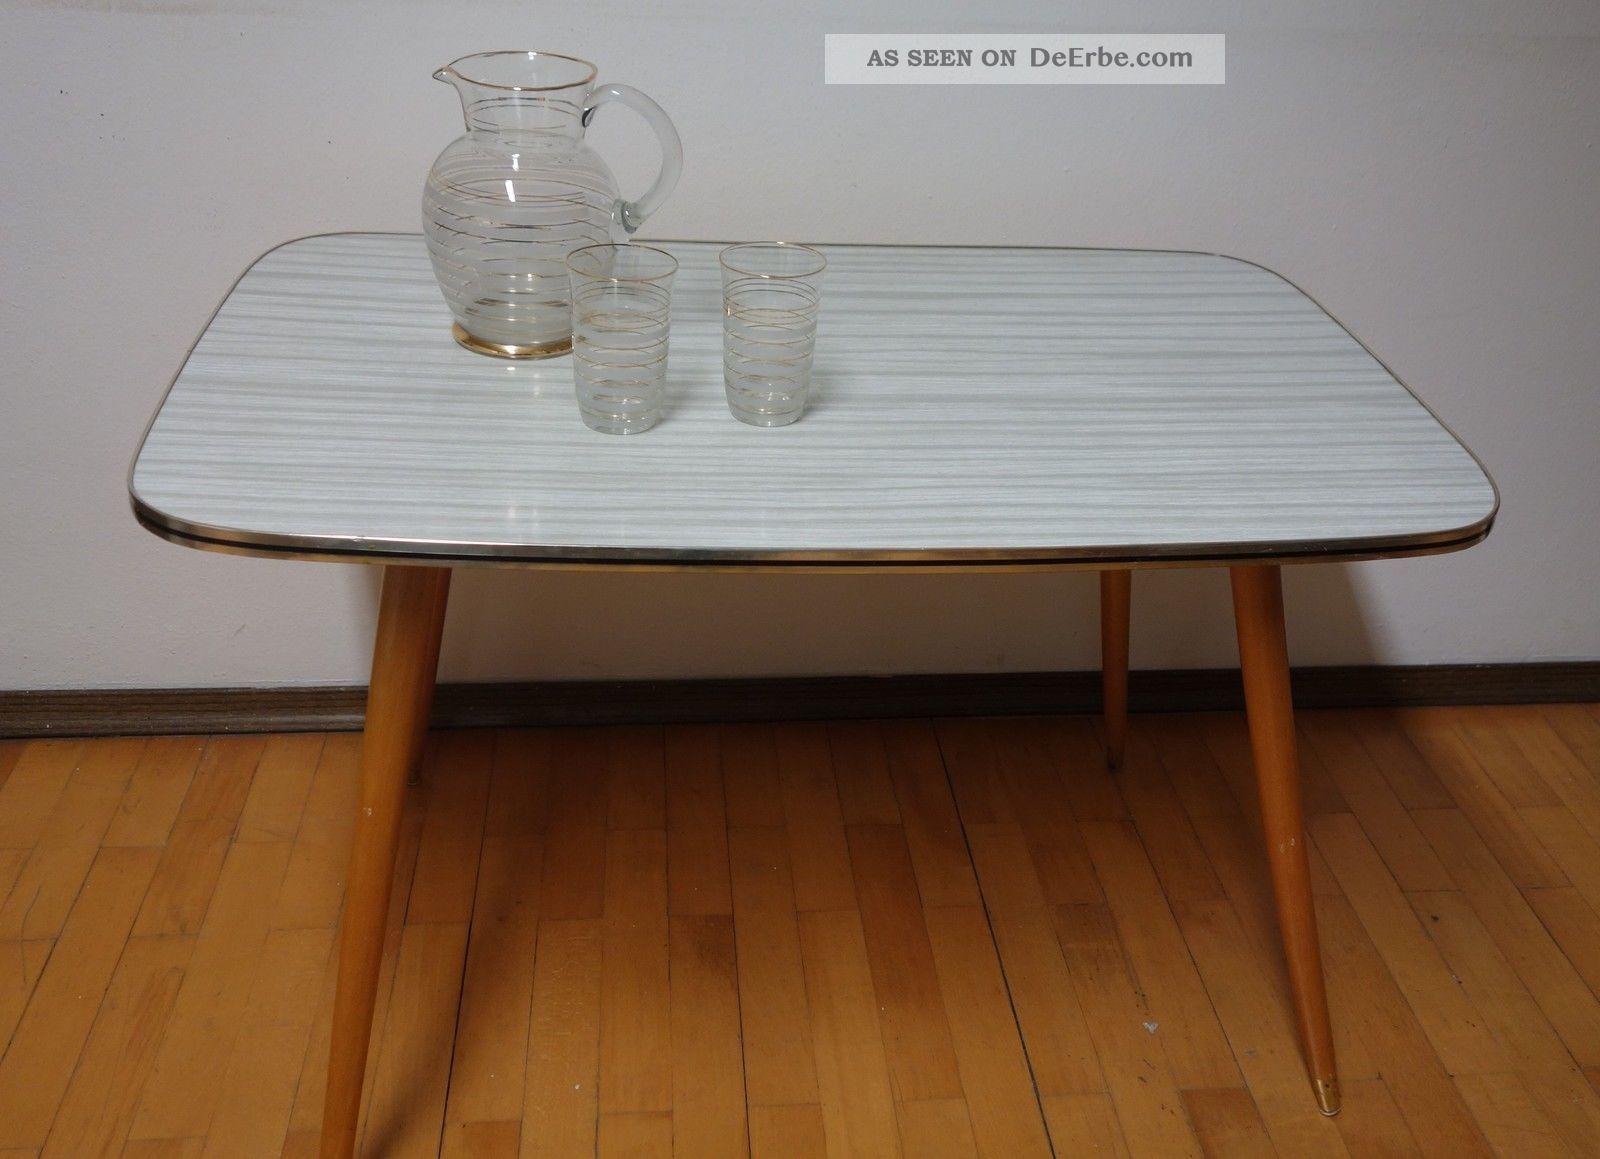 kultiger nierentisch rechteckig aus den 50er 60er jahren rockabilly. Black Bedroom Furniture Sets. Home Design Ideas